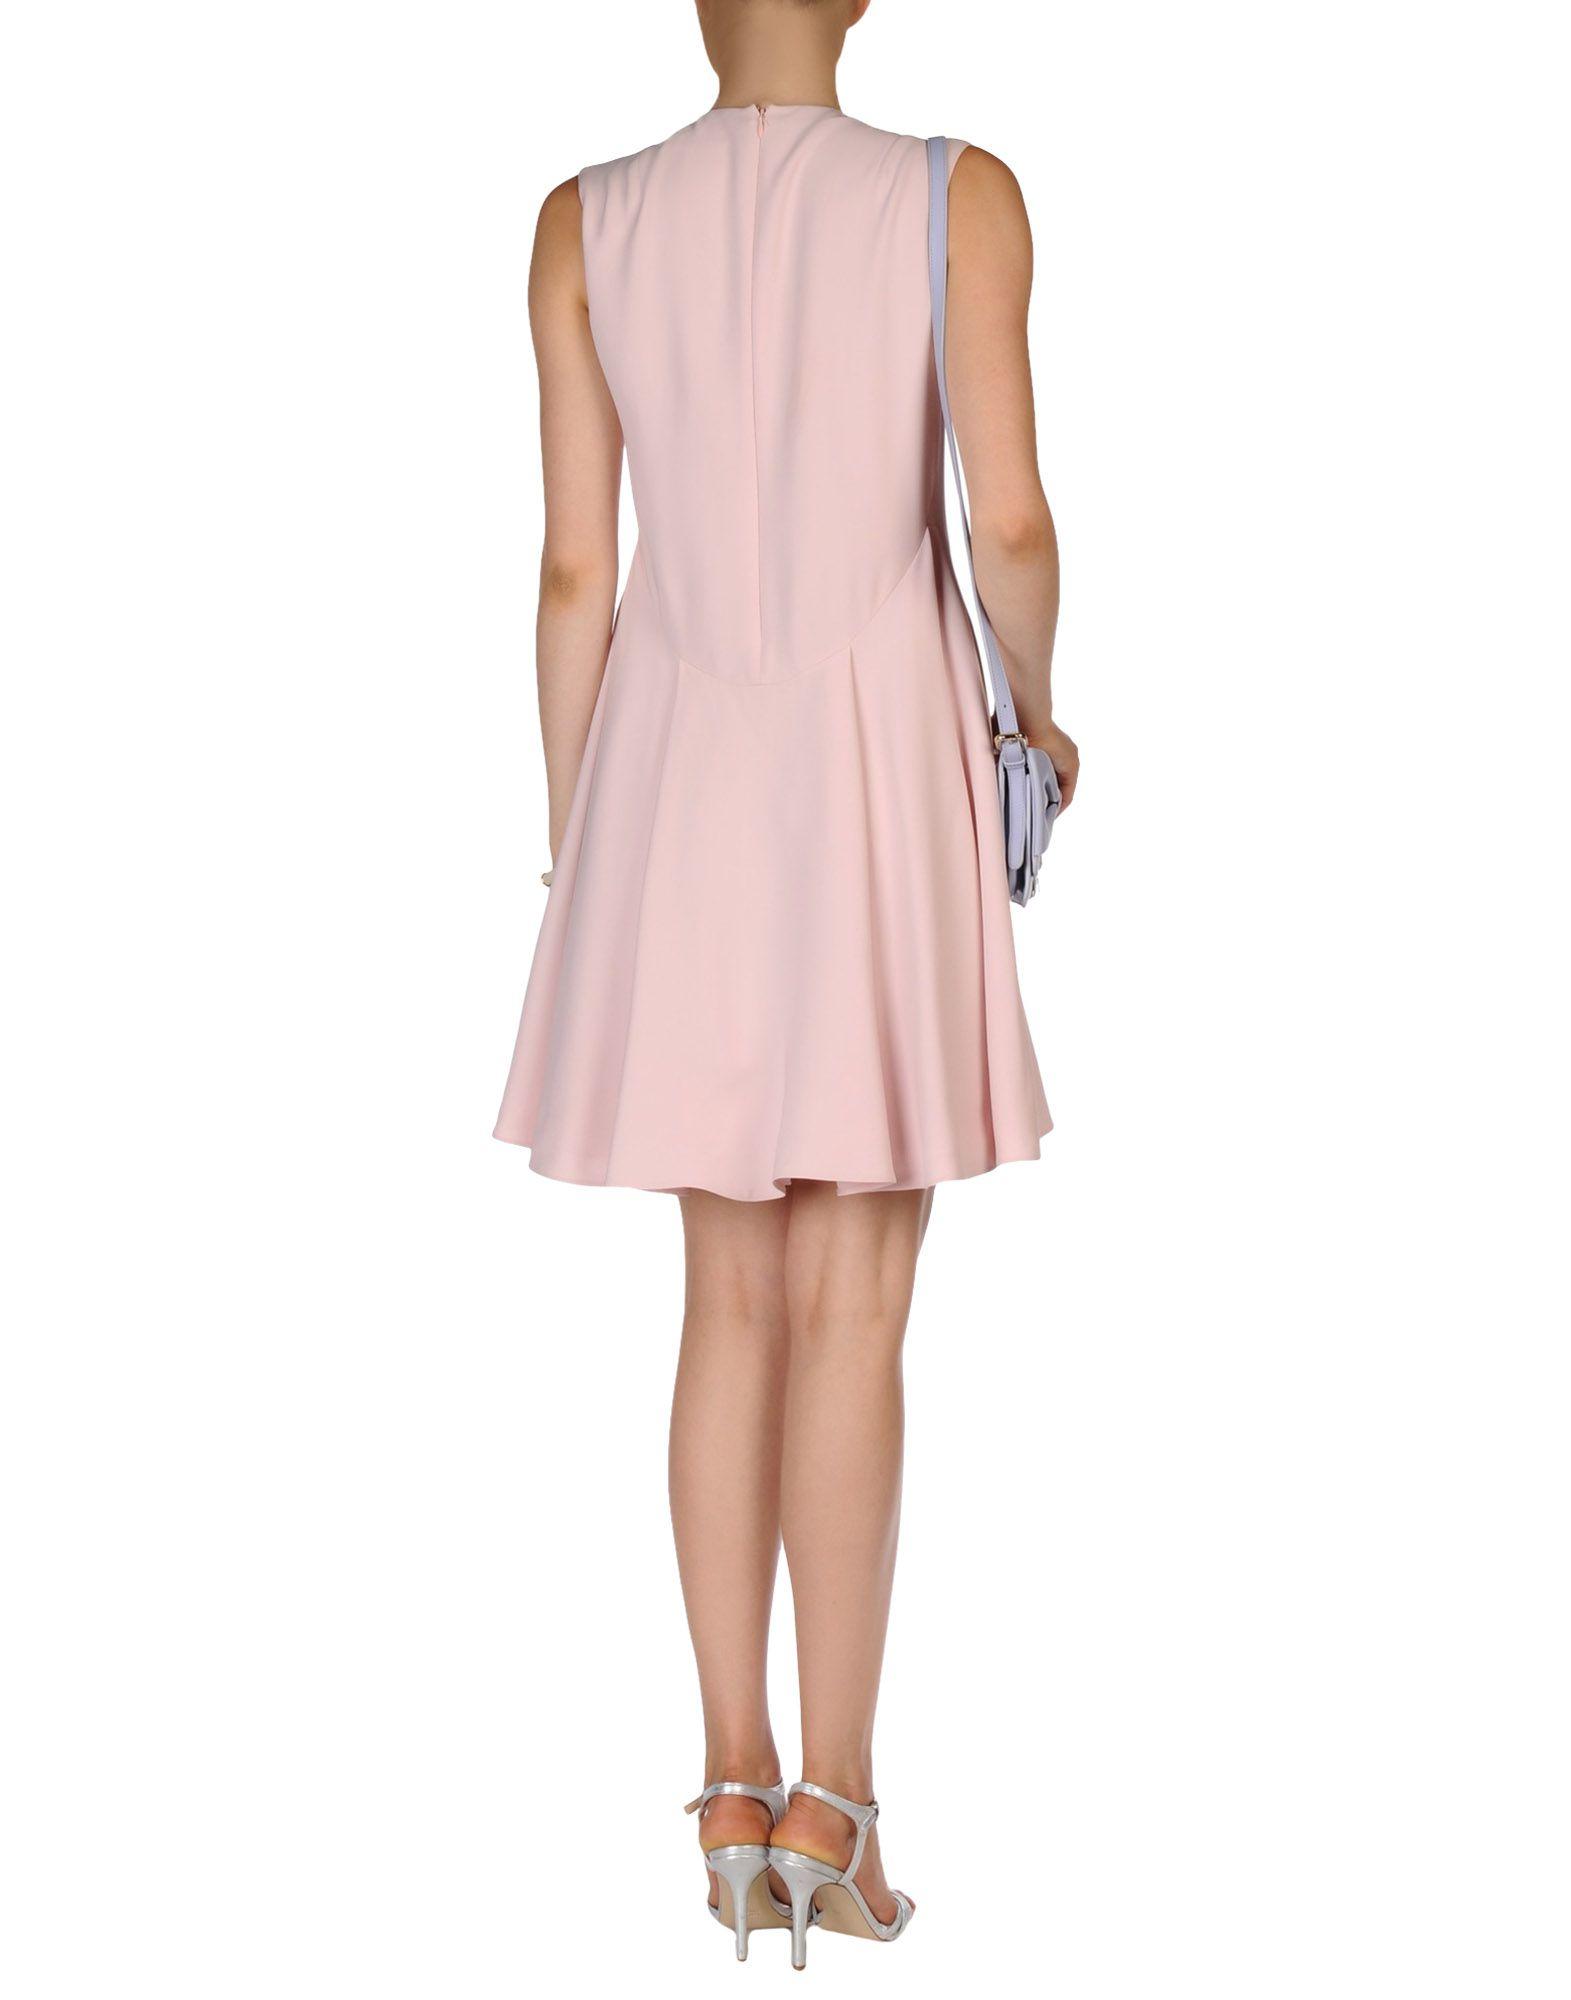 dior short dresses - photo #39